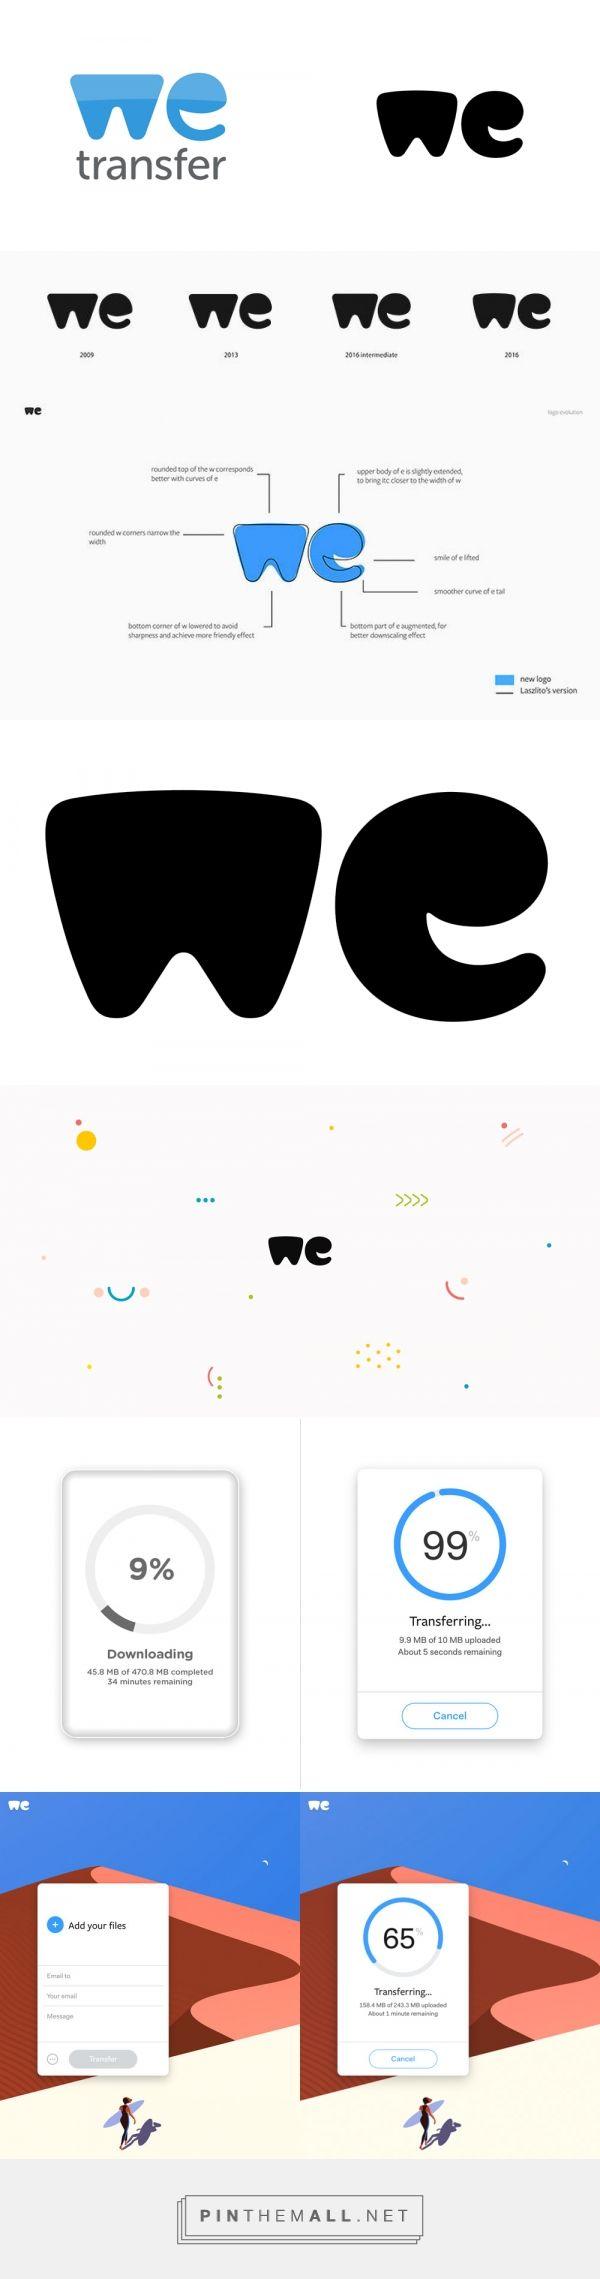 192 Best Logo Images On Pinterest Brand Identity Logos And Brand